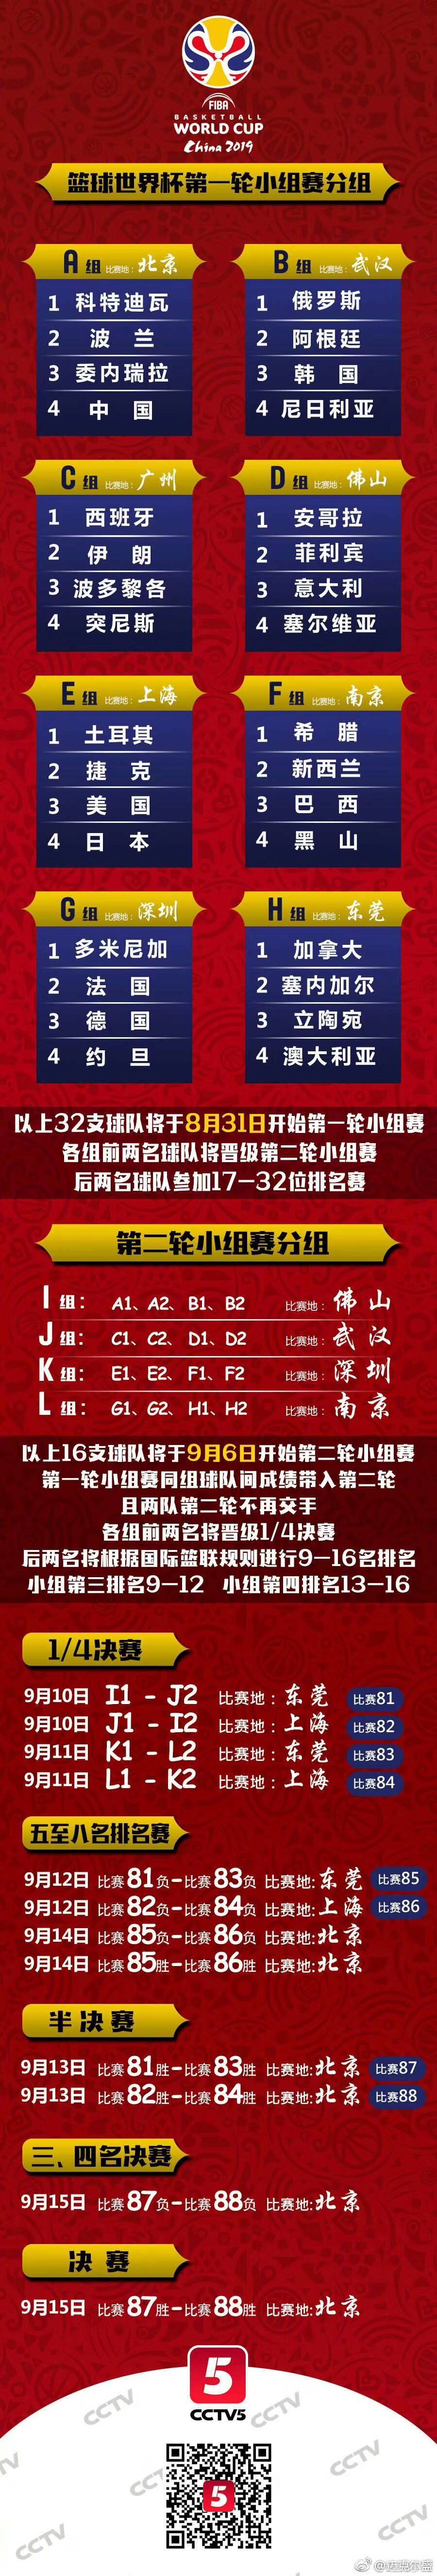 fiba 篮球世界杯中国男篮赛程时间:2019.8.31 中国vs科特迪瓦2019.9.